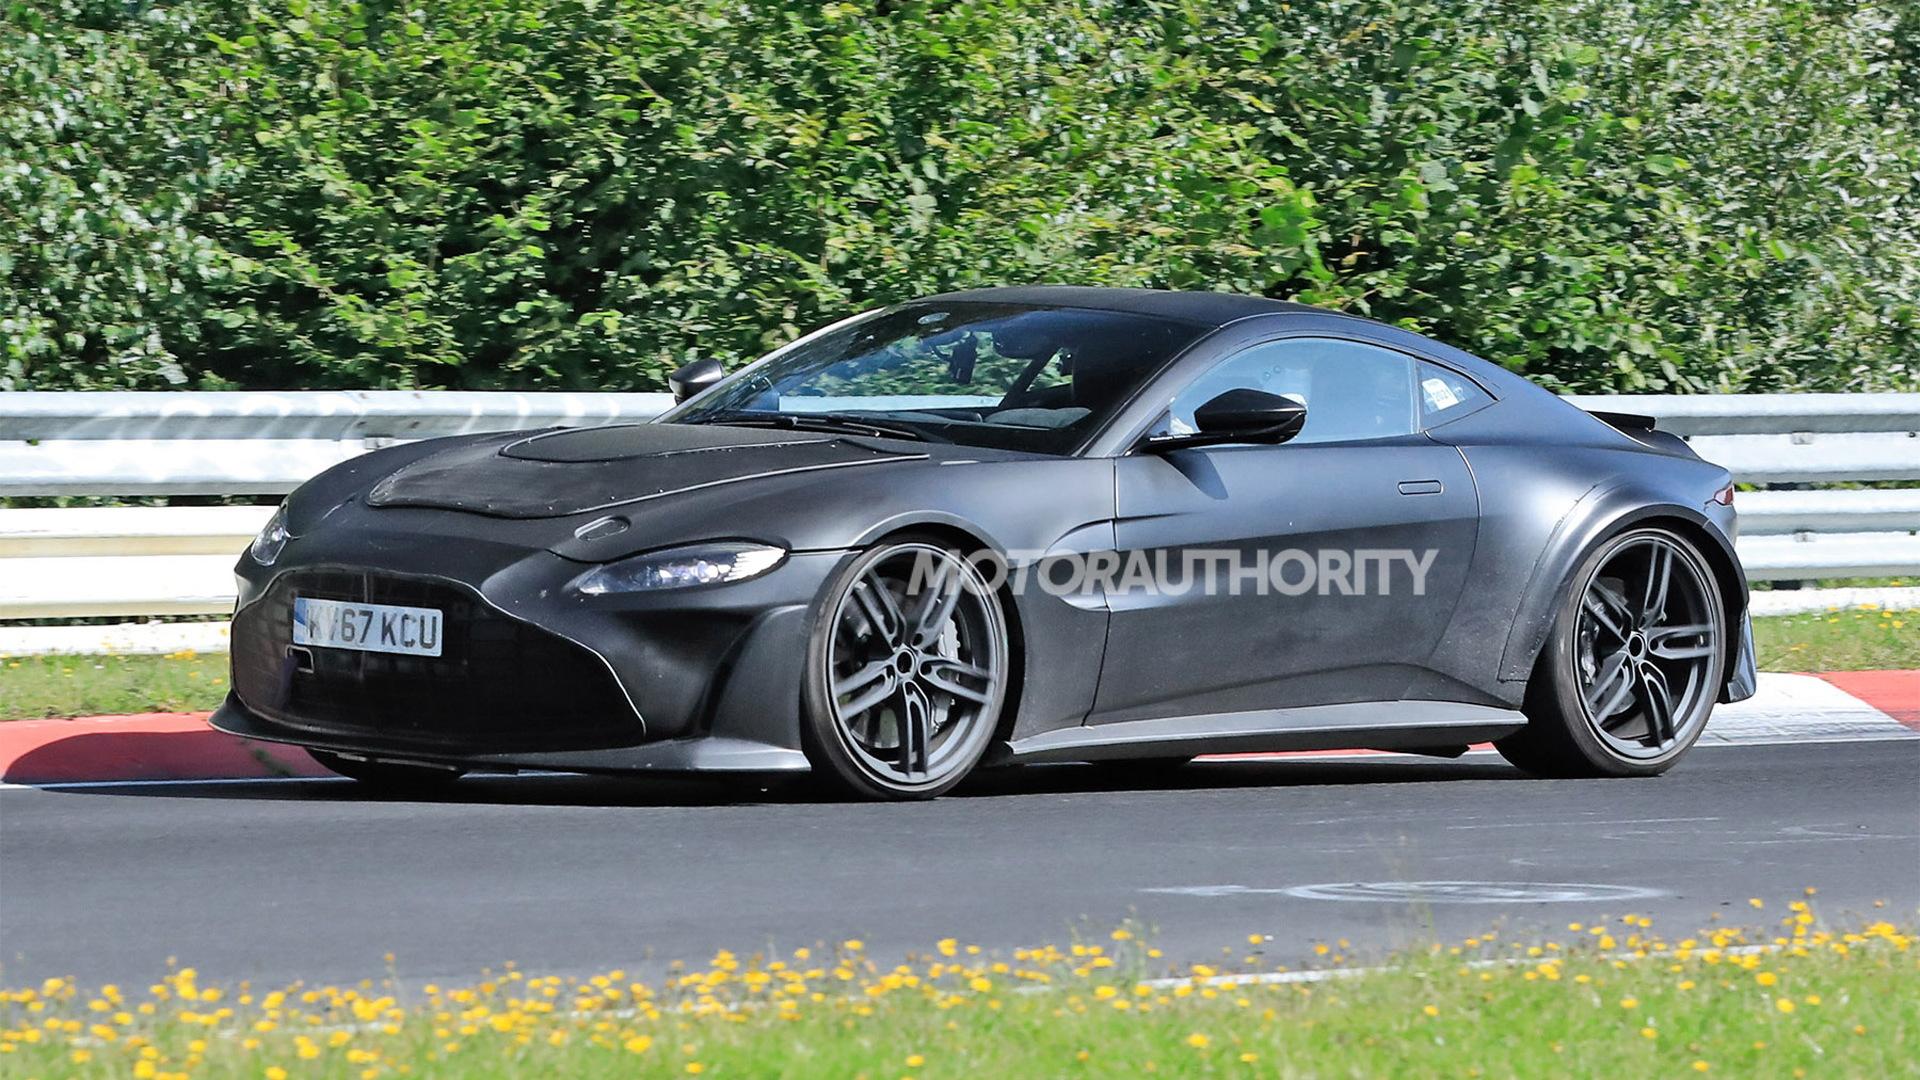 2023 Aston Martin Vantage V12 RS spy shots - Photo credit: S. Baldauf/SB-Medien